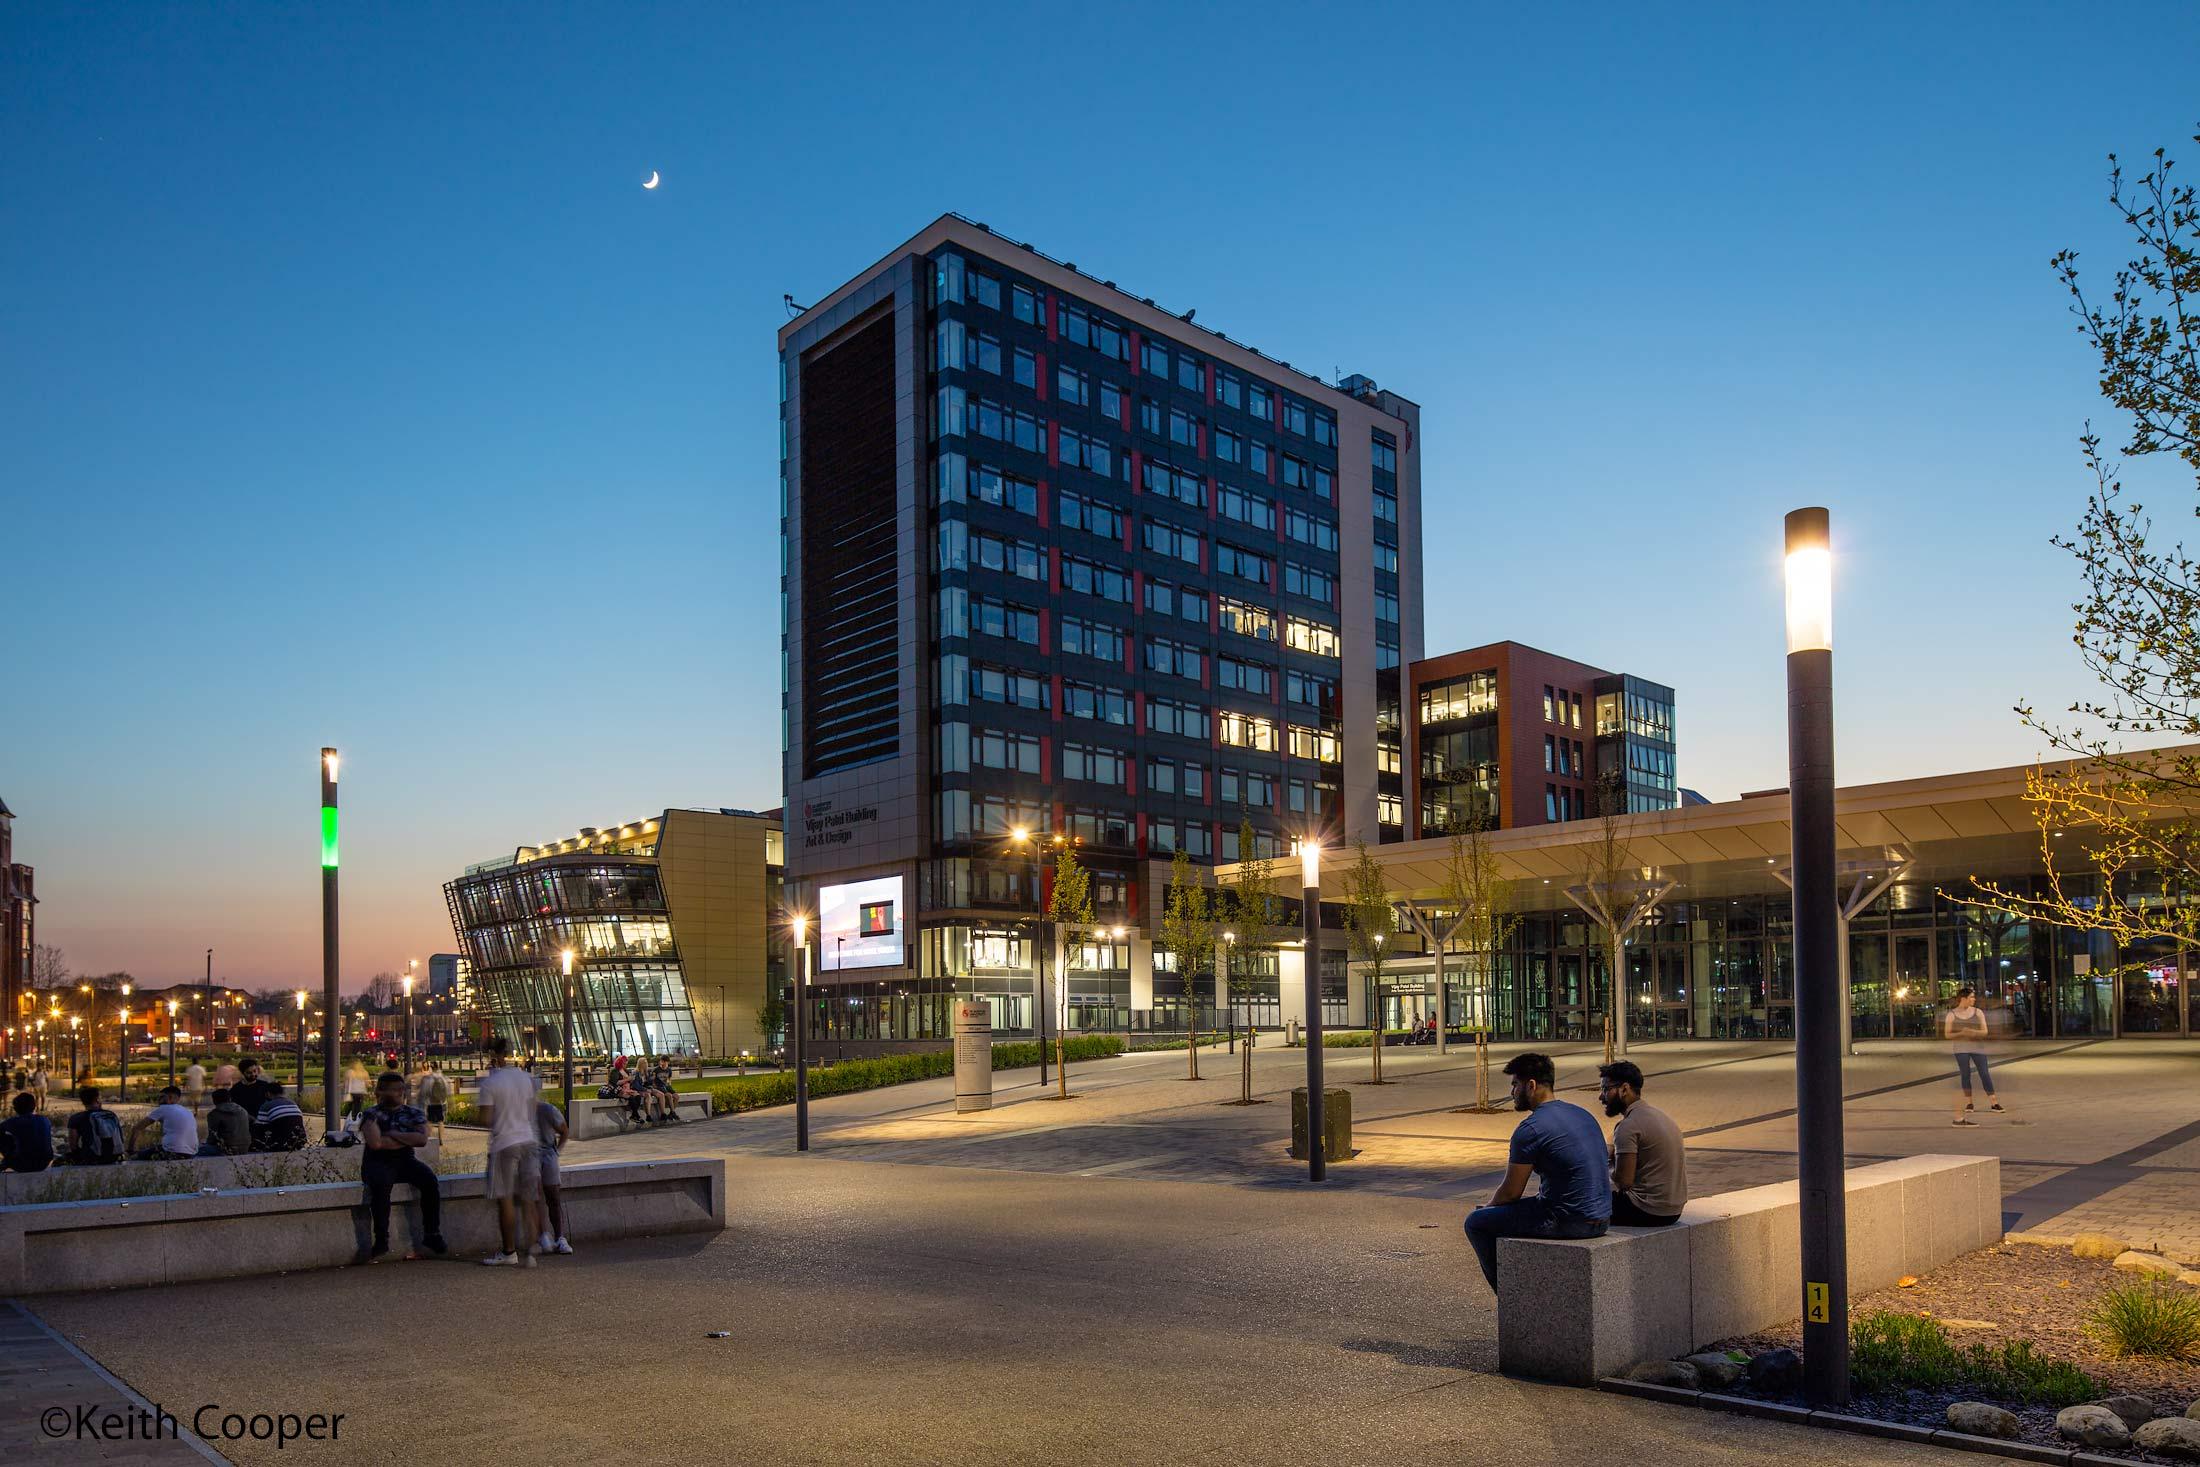 DMU campus dusk